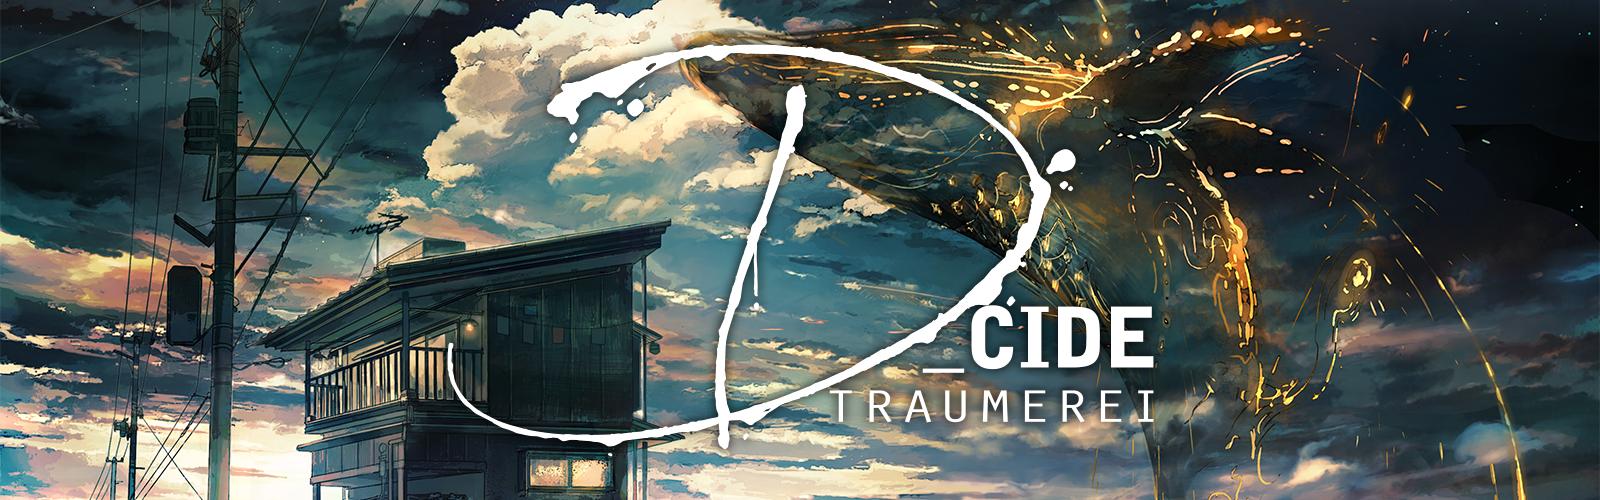 D_CIDE TRAUMEREI